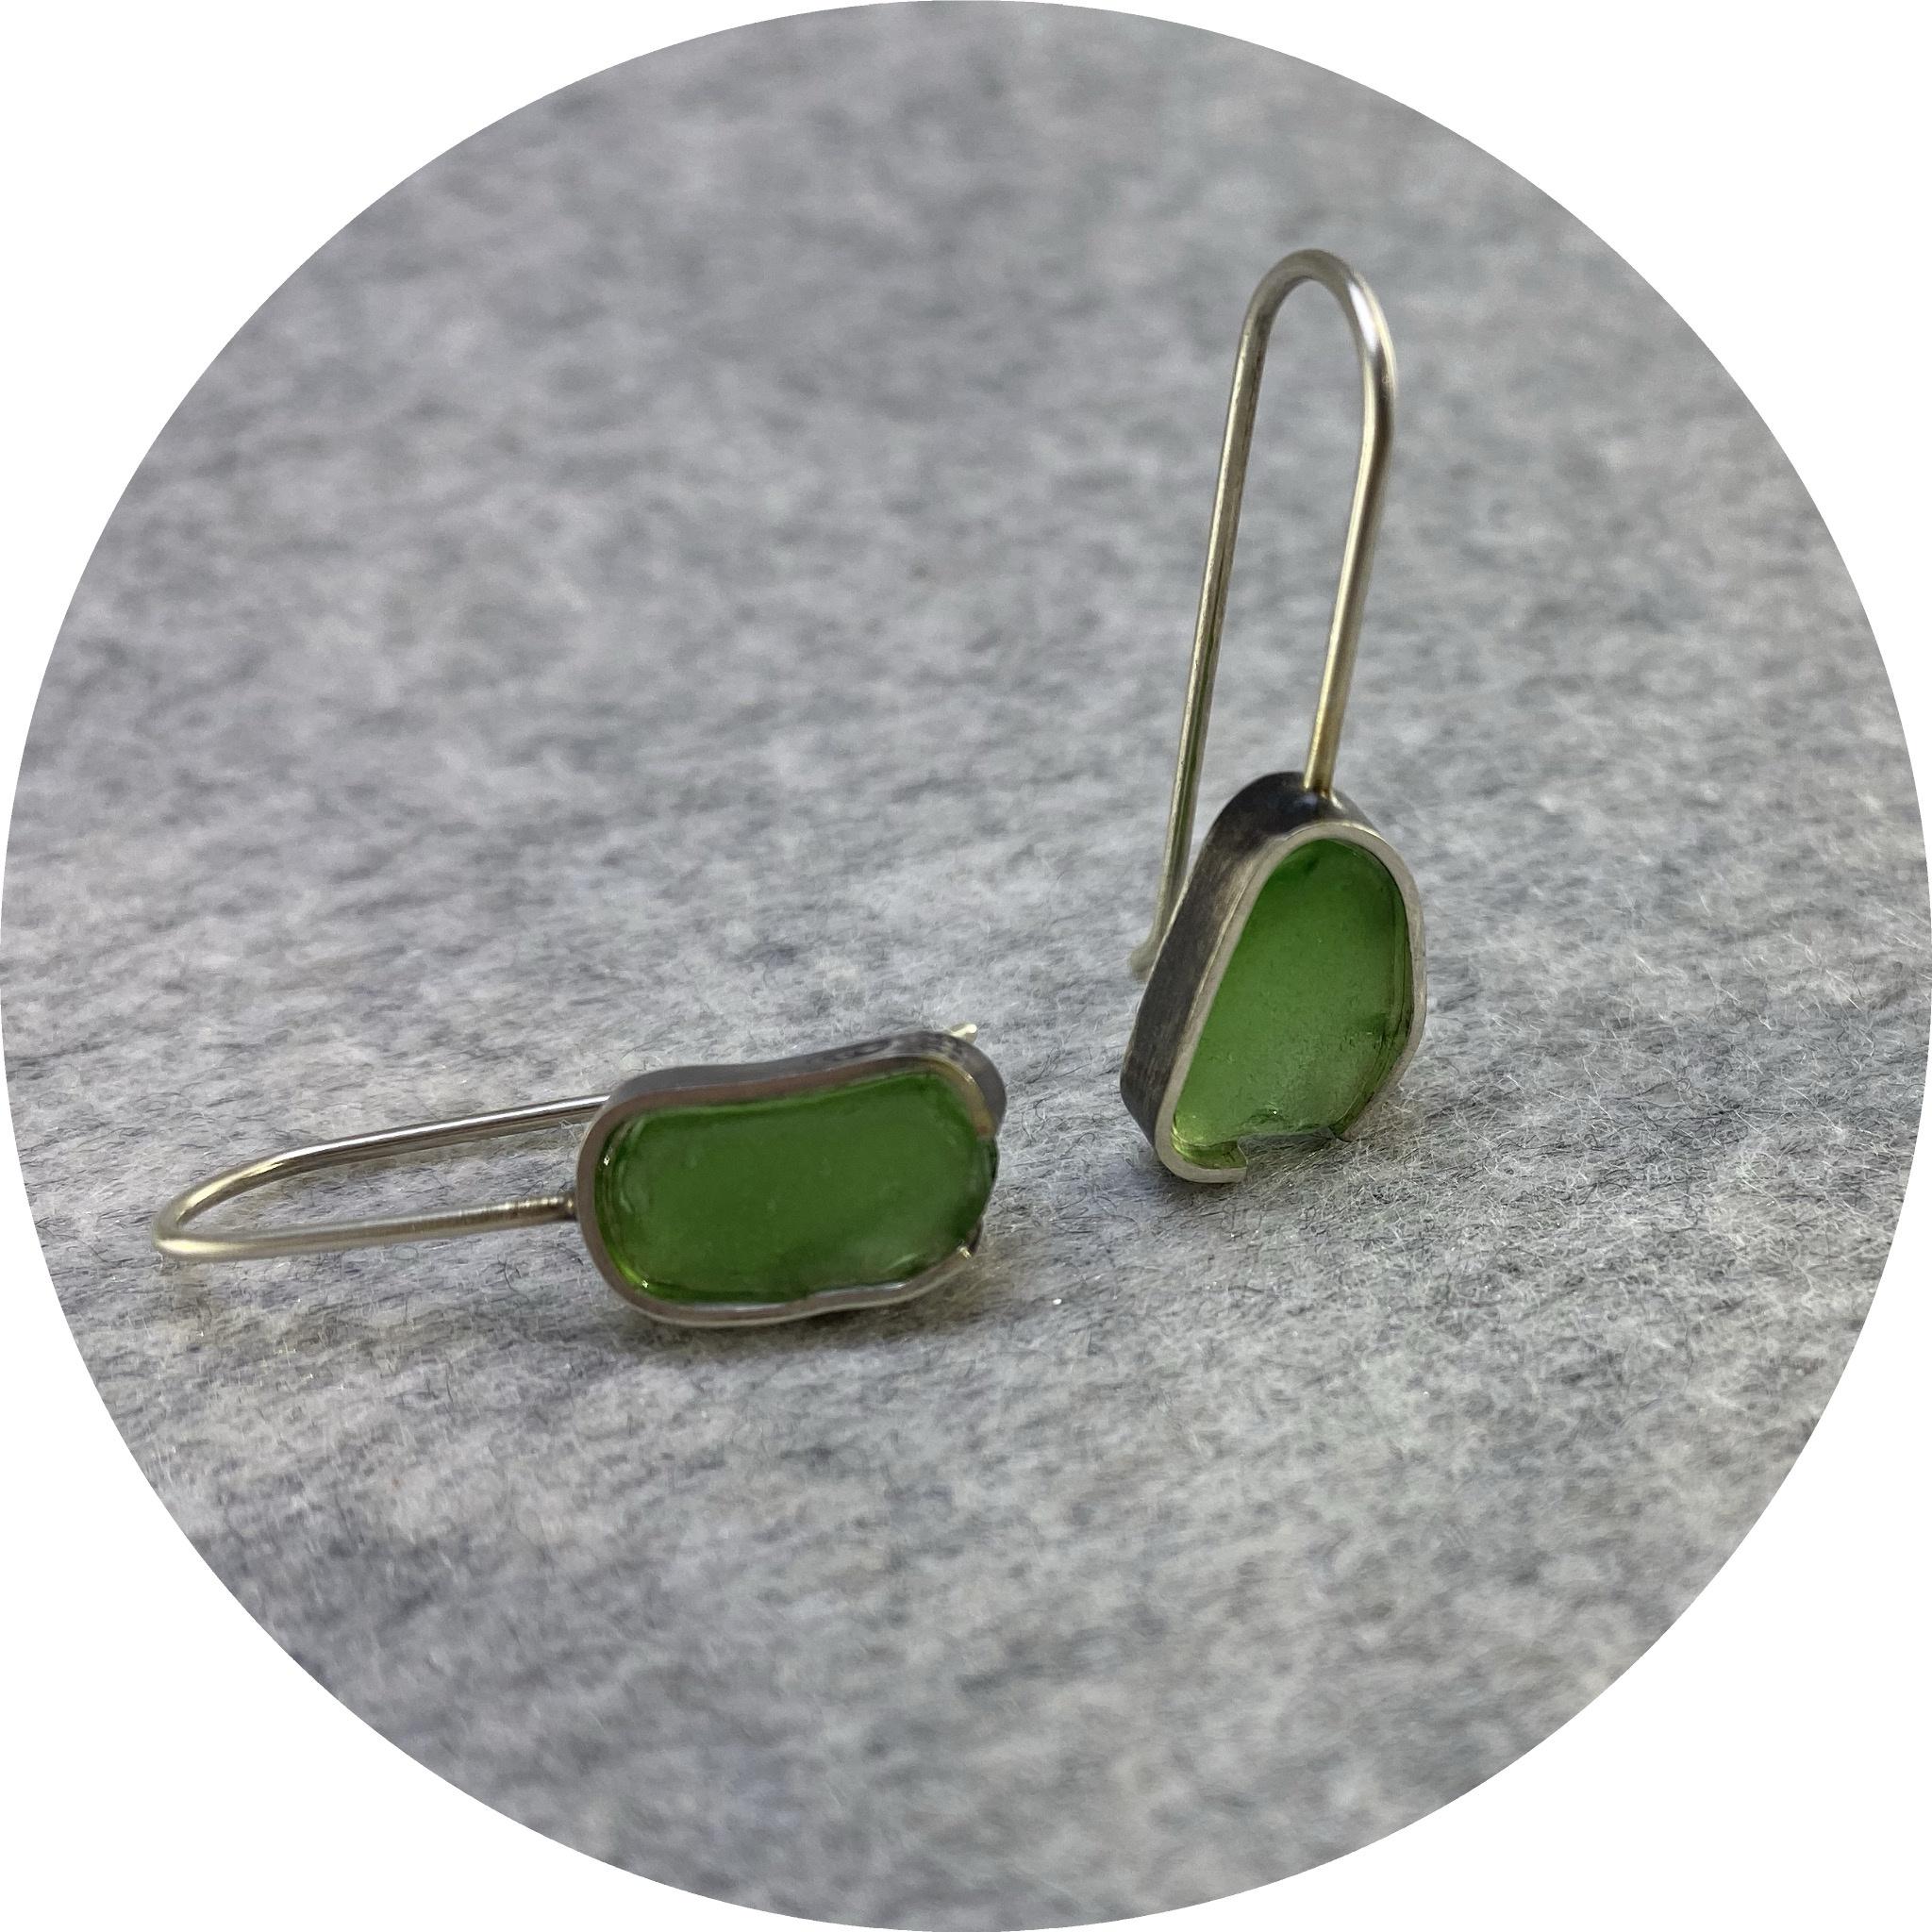 Susan Ewington - 'Green Beach Glass Earrings', 925 silver, glass